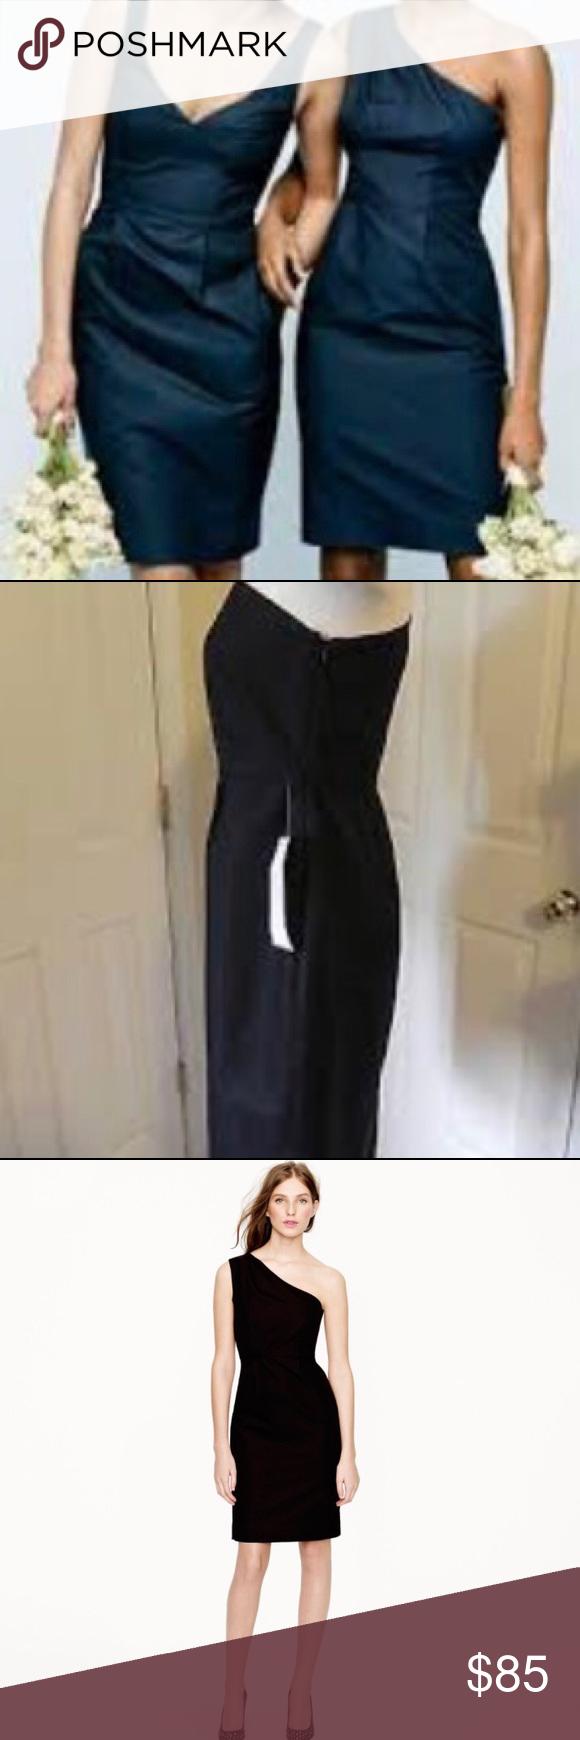 Black dress j crew - J Crew Misha One Shoulder Black Dress J Crew Misha Black One Shoulder Dress